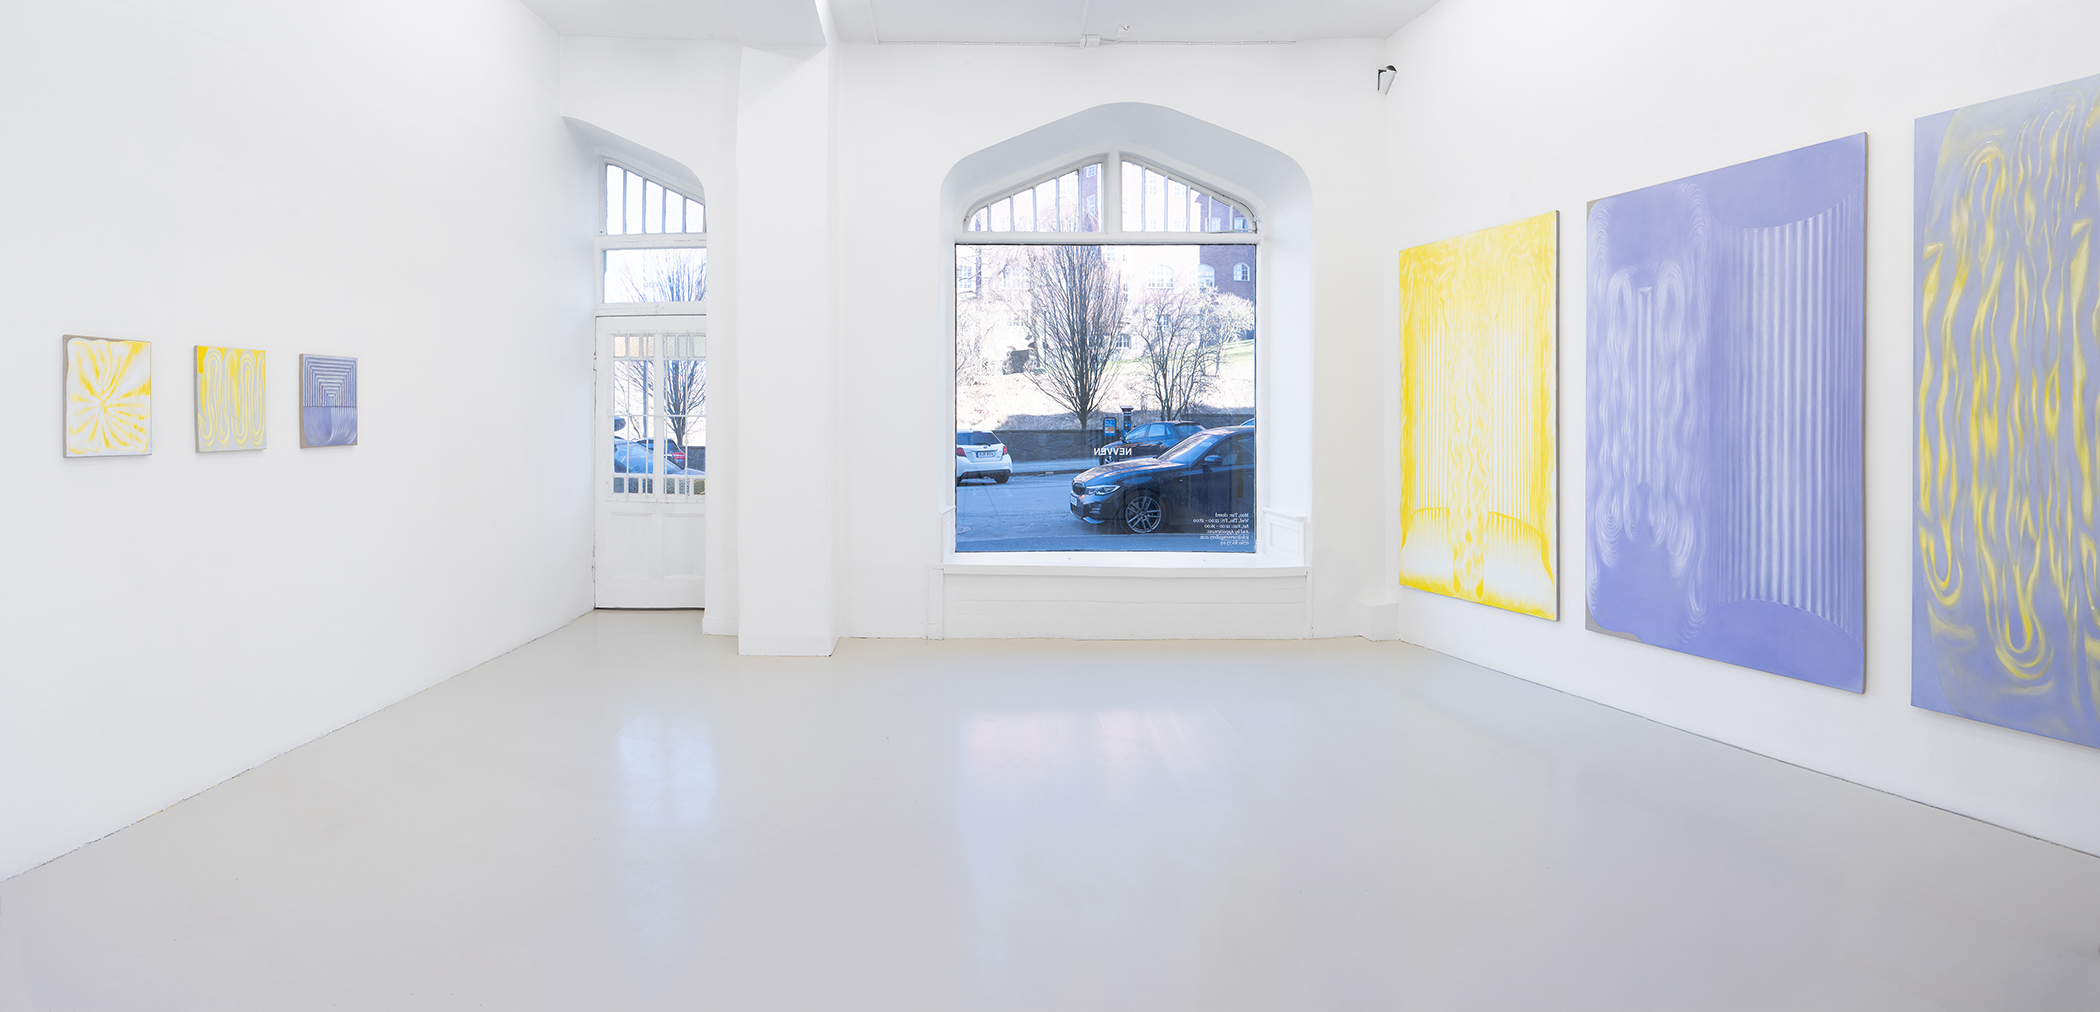 Vika Prokopaviciute, Pale Echo installation view. Courtesy of Vika Prokopaviciute and NEVVEN. Photography by David Eng.